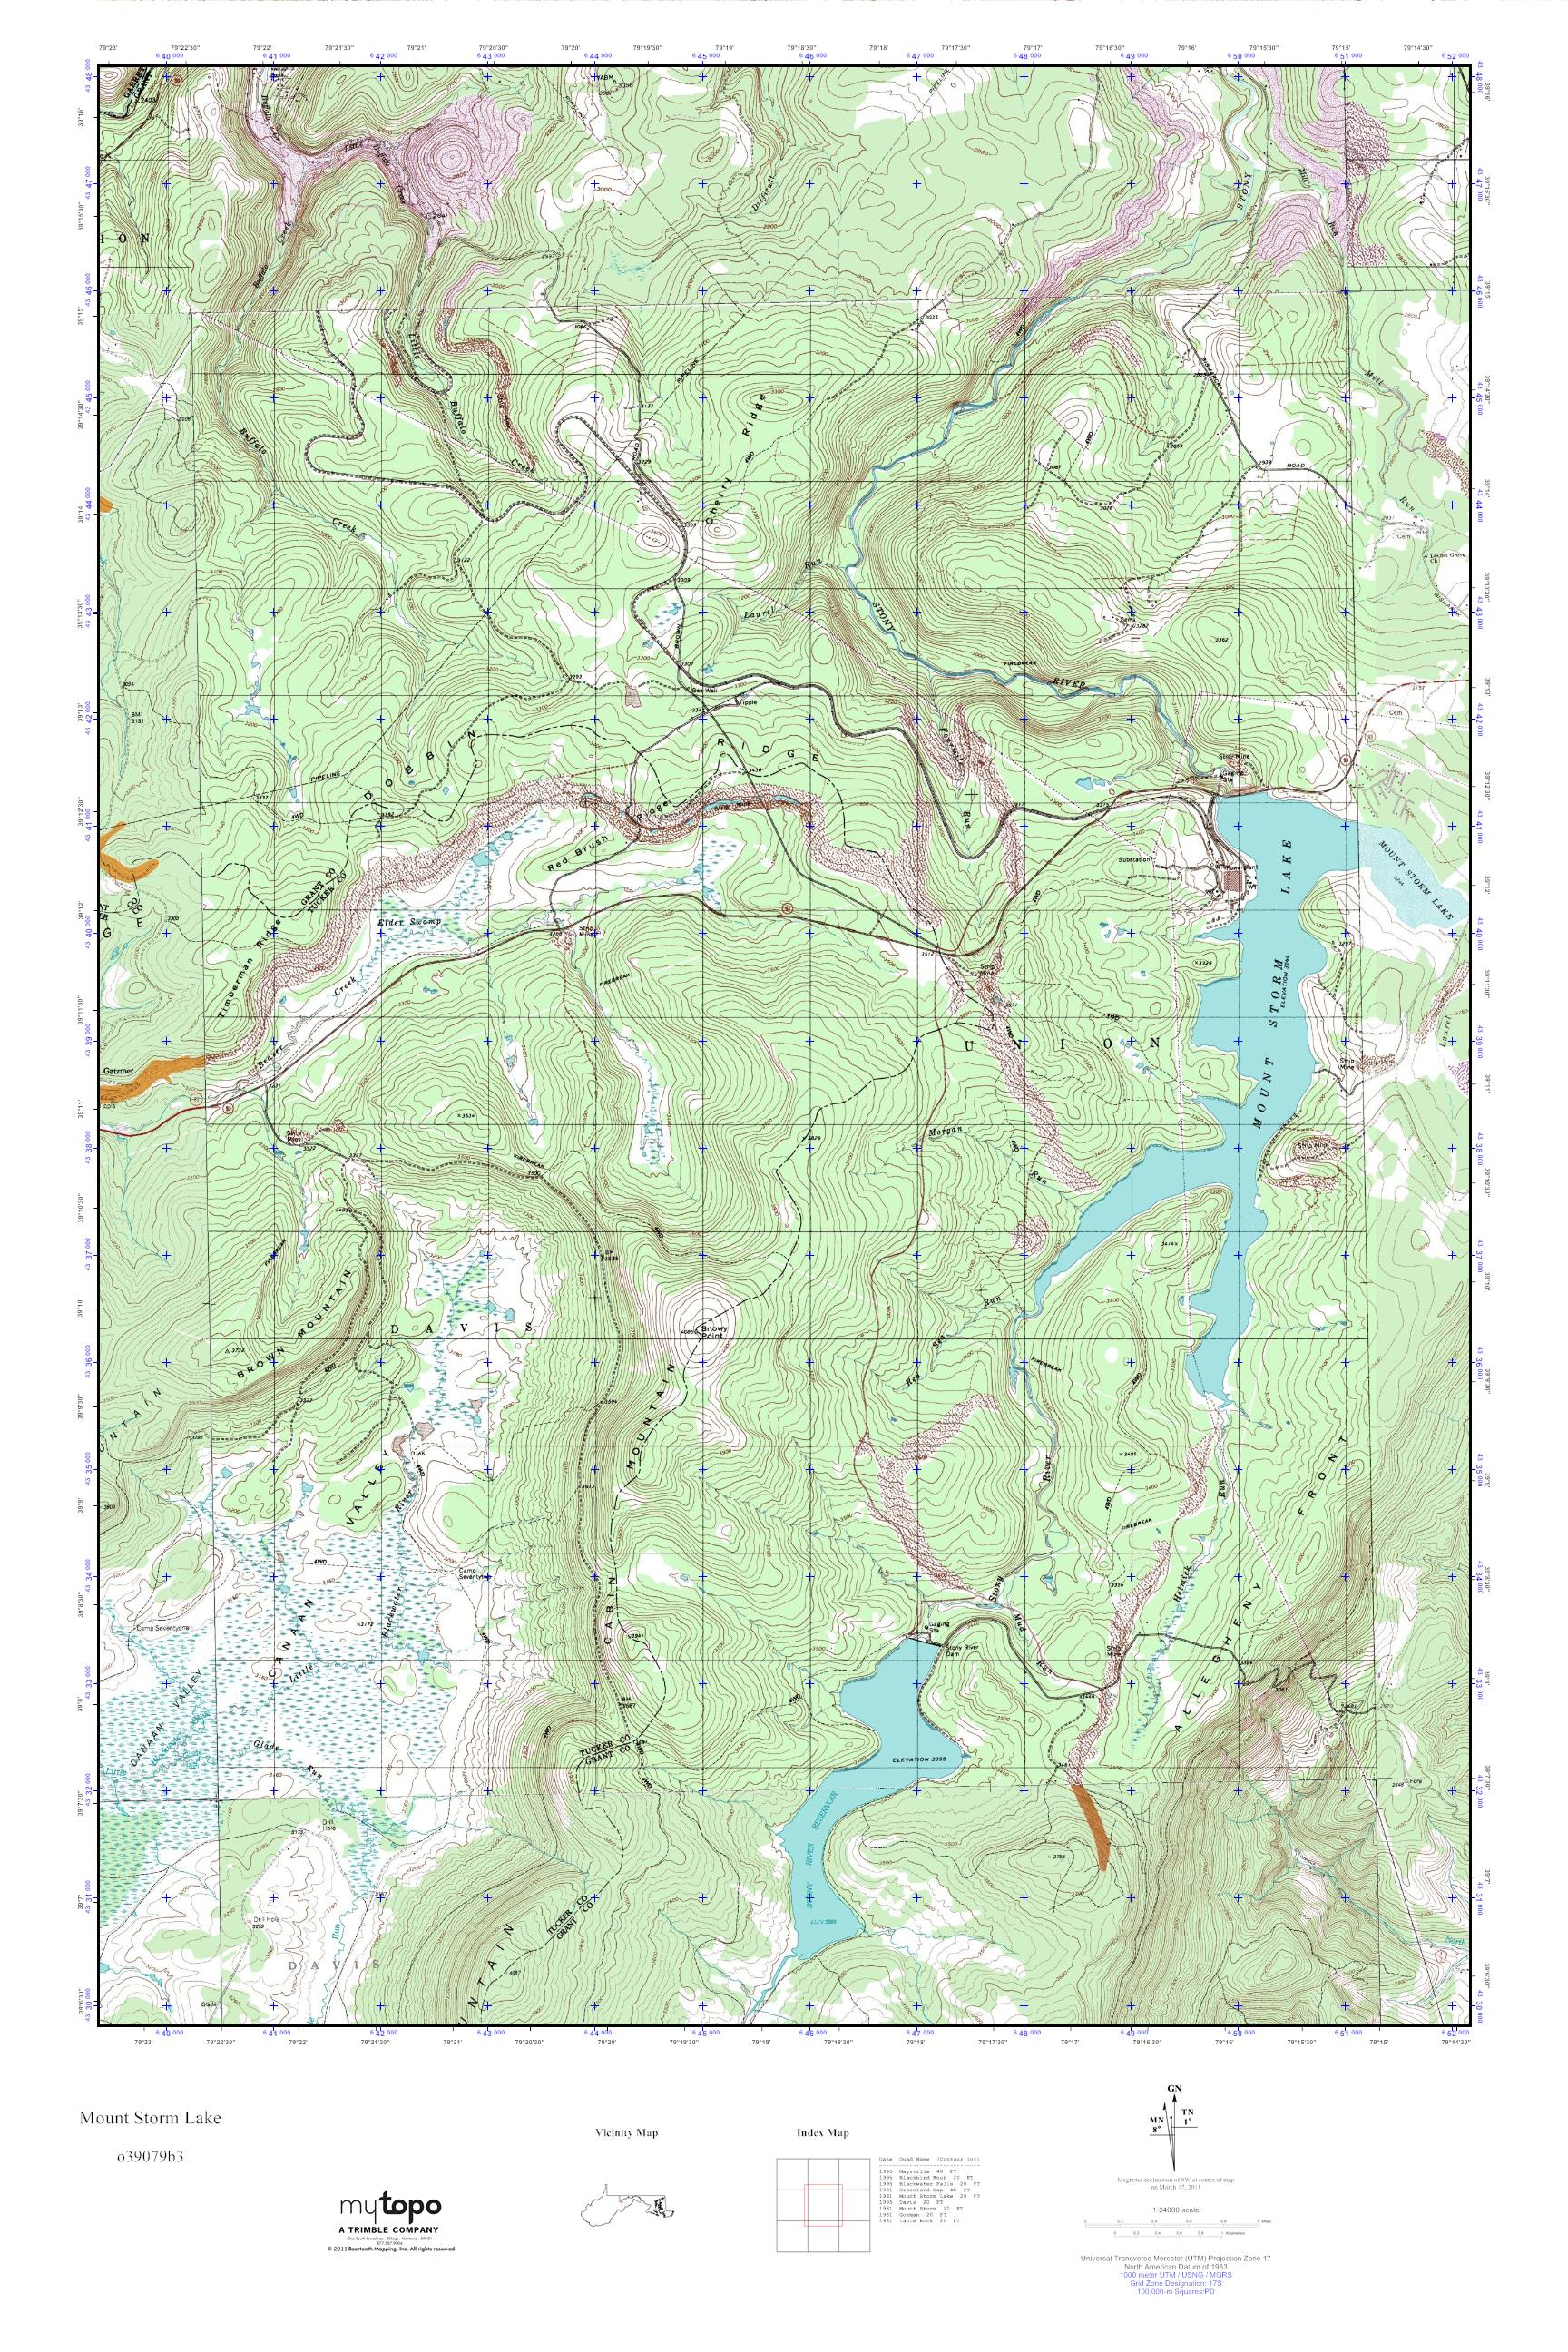 MyTopo Mount Storm Lake, West Virginia USGS Quad Topo Map